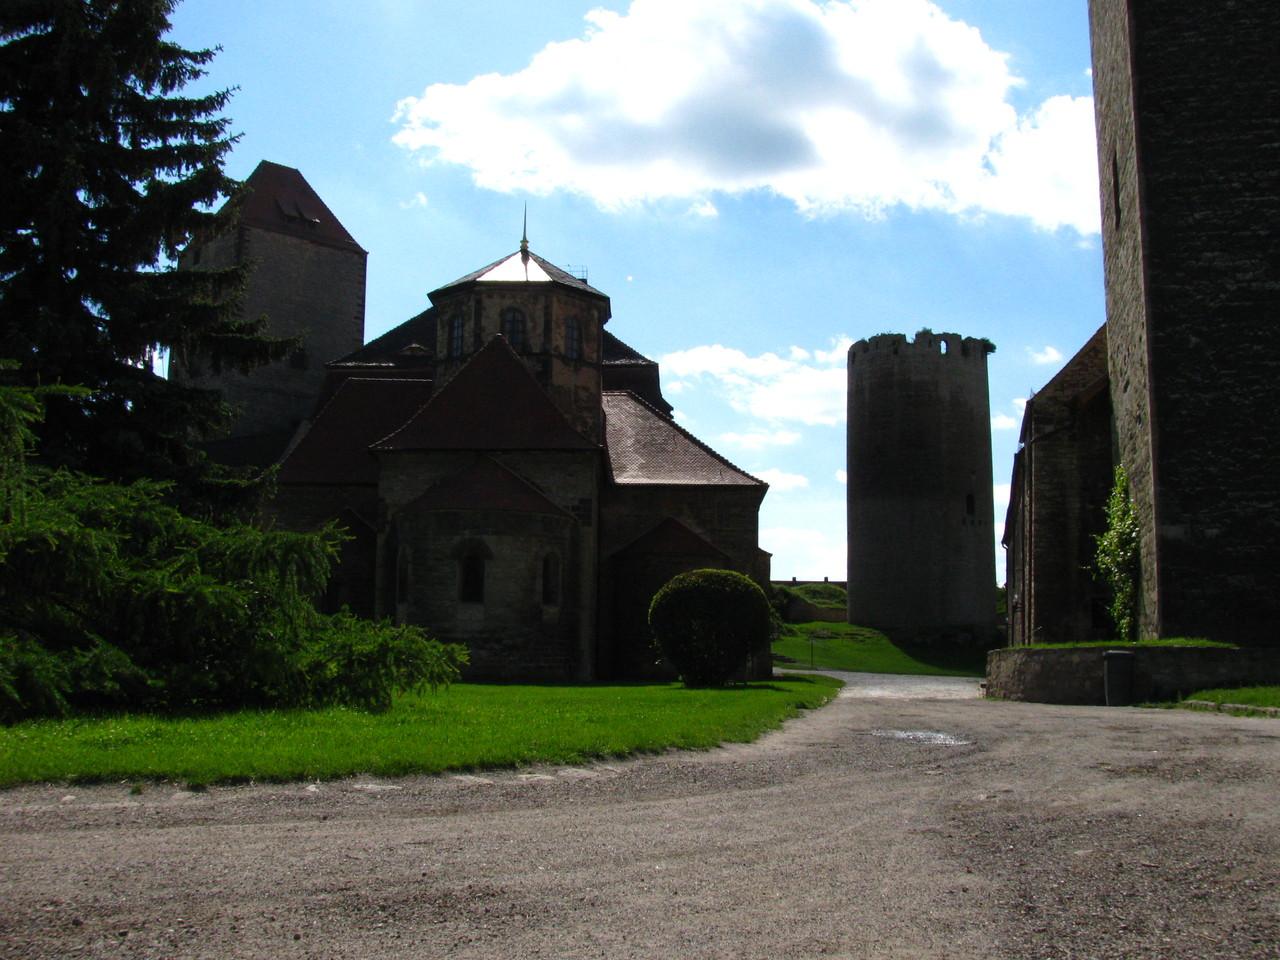 Burg Querfurt im Sommer